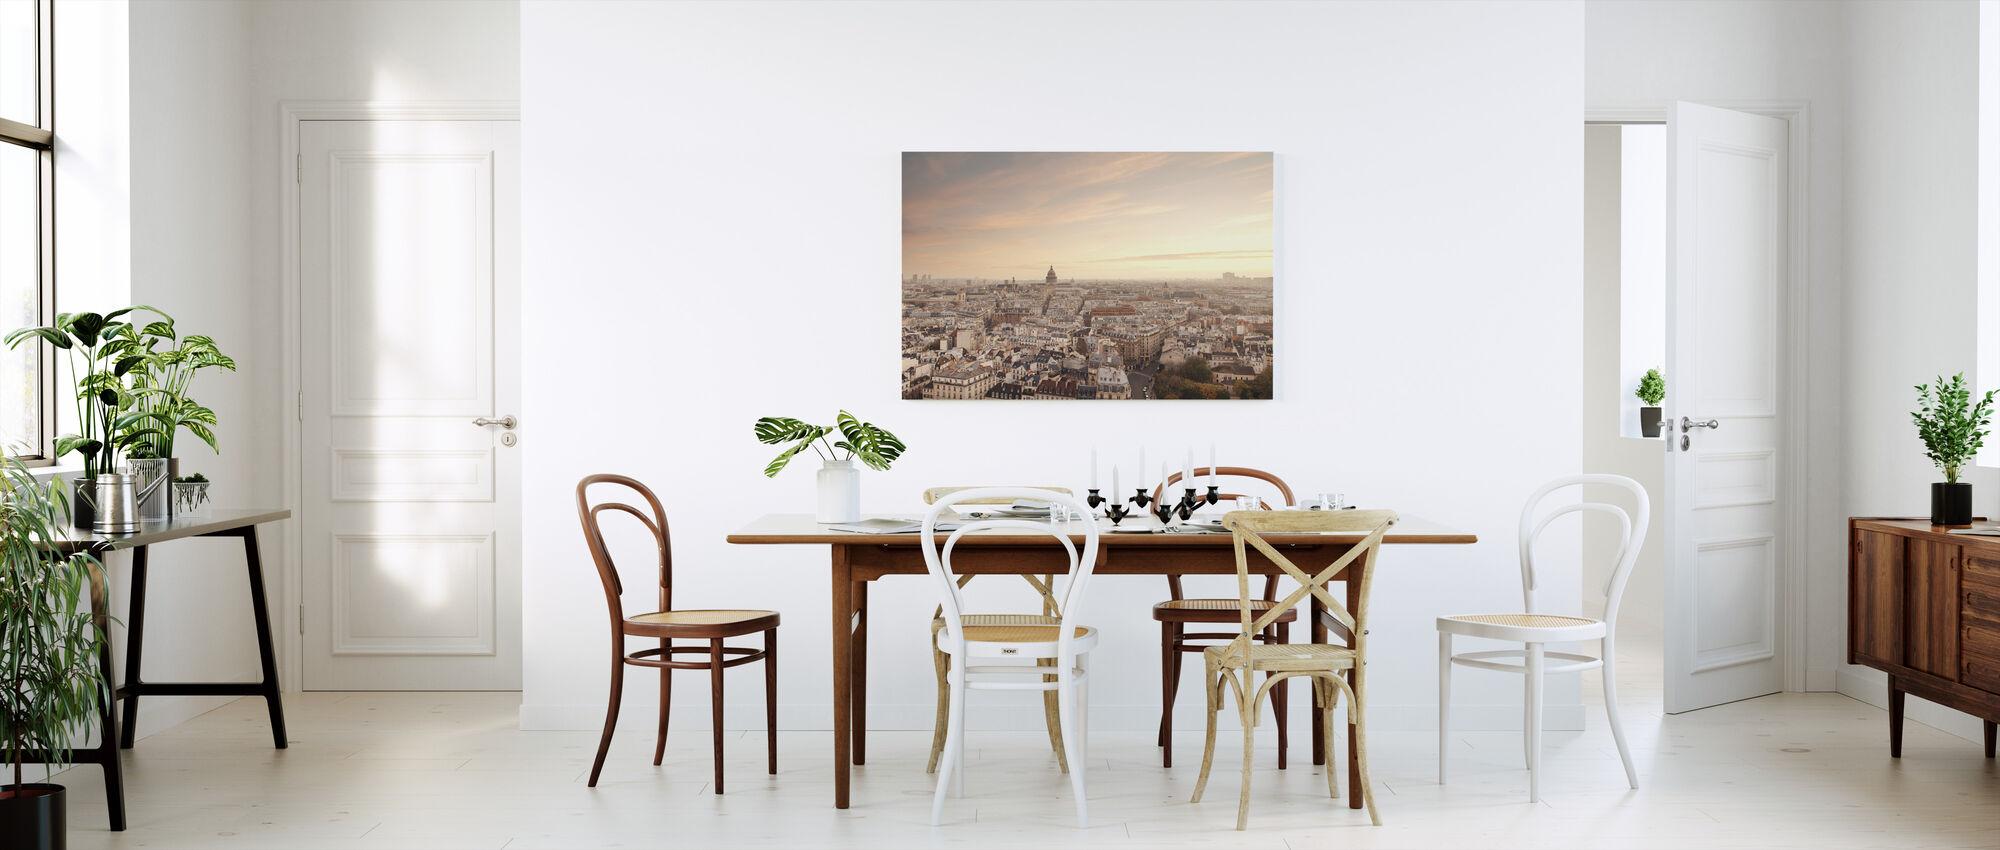 Sunset over Paris - Canvas print - Kitchen